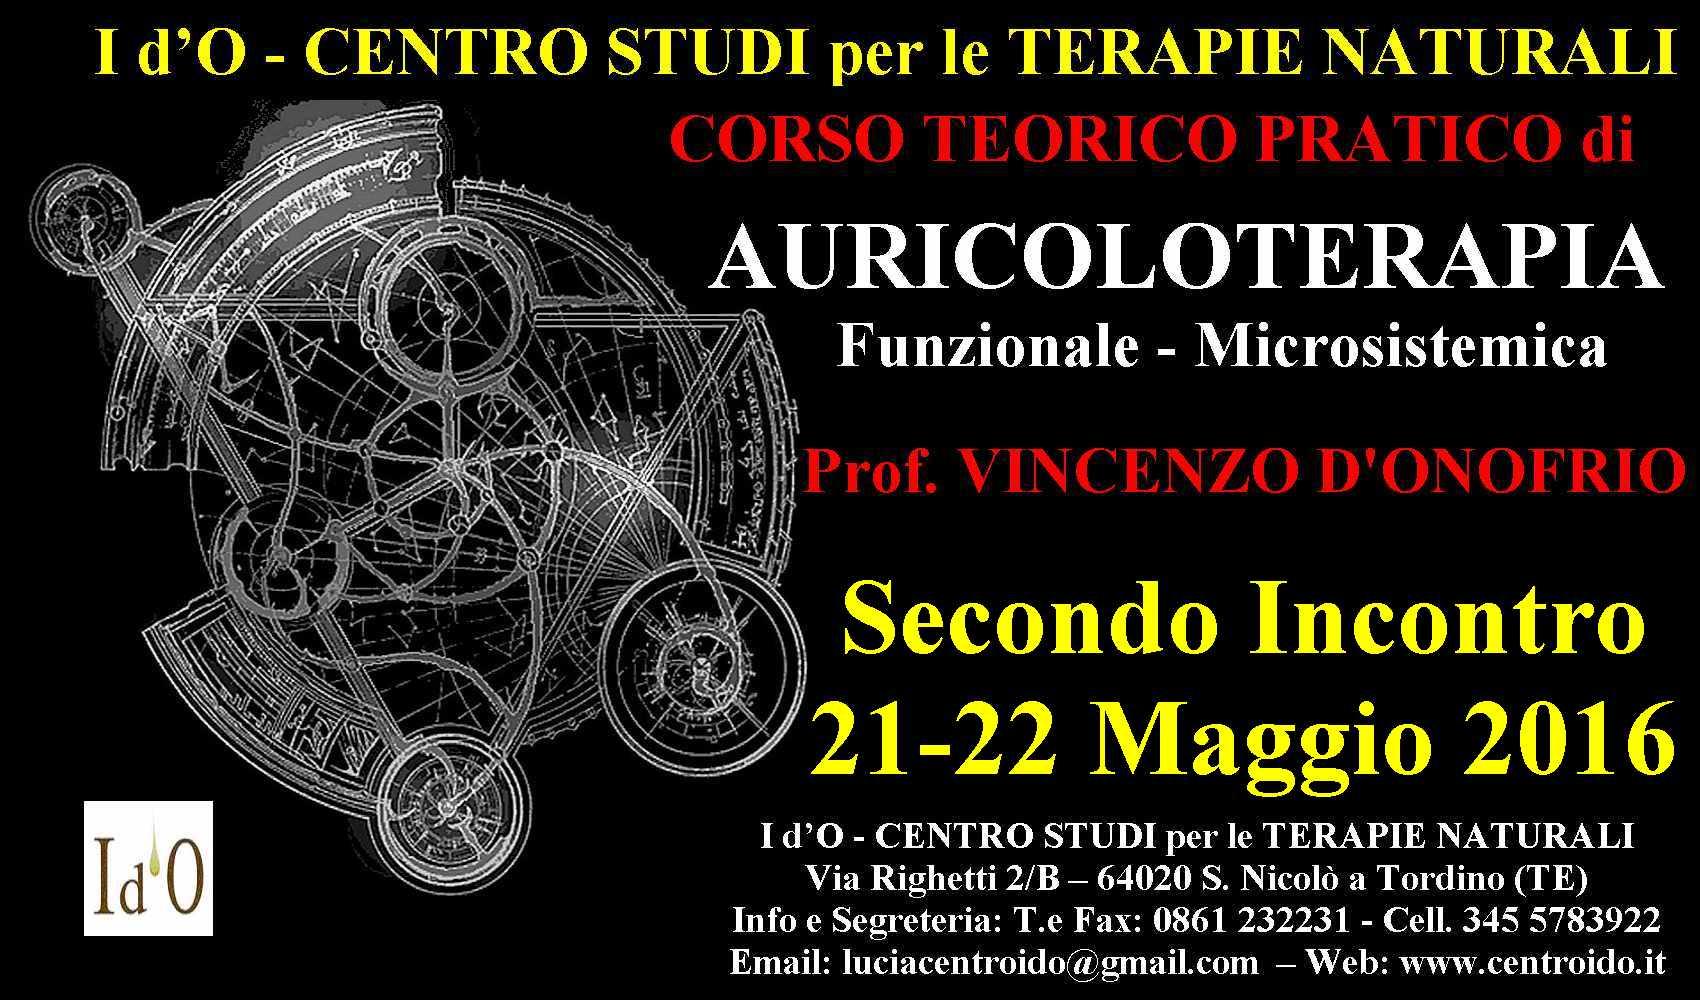 Auricolo3